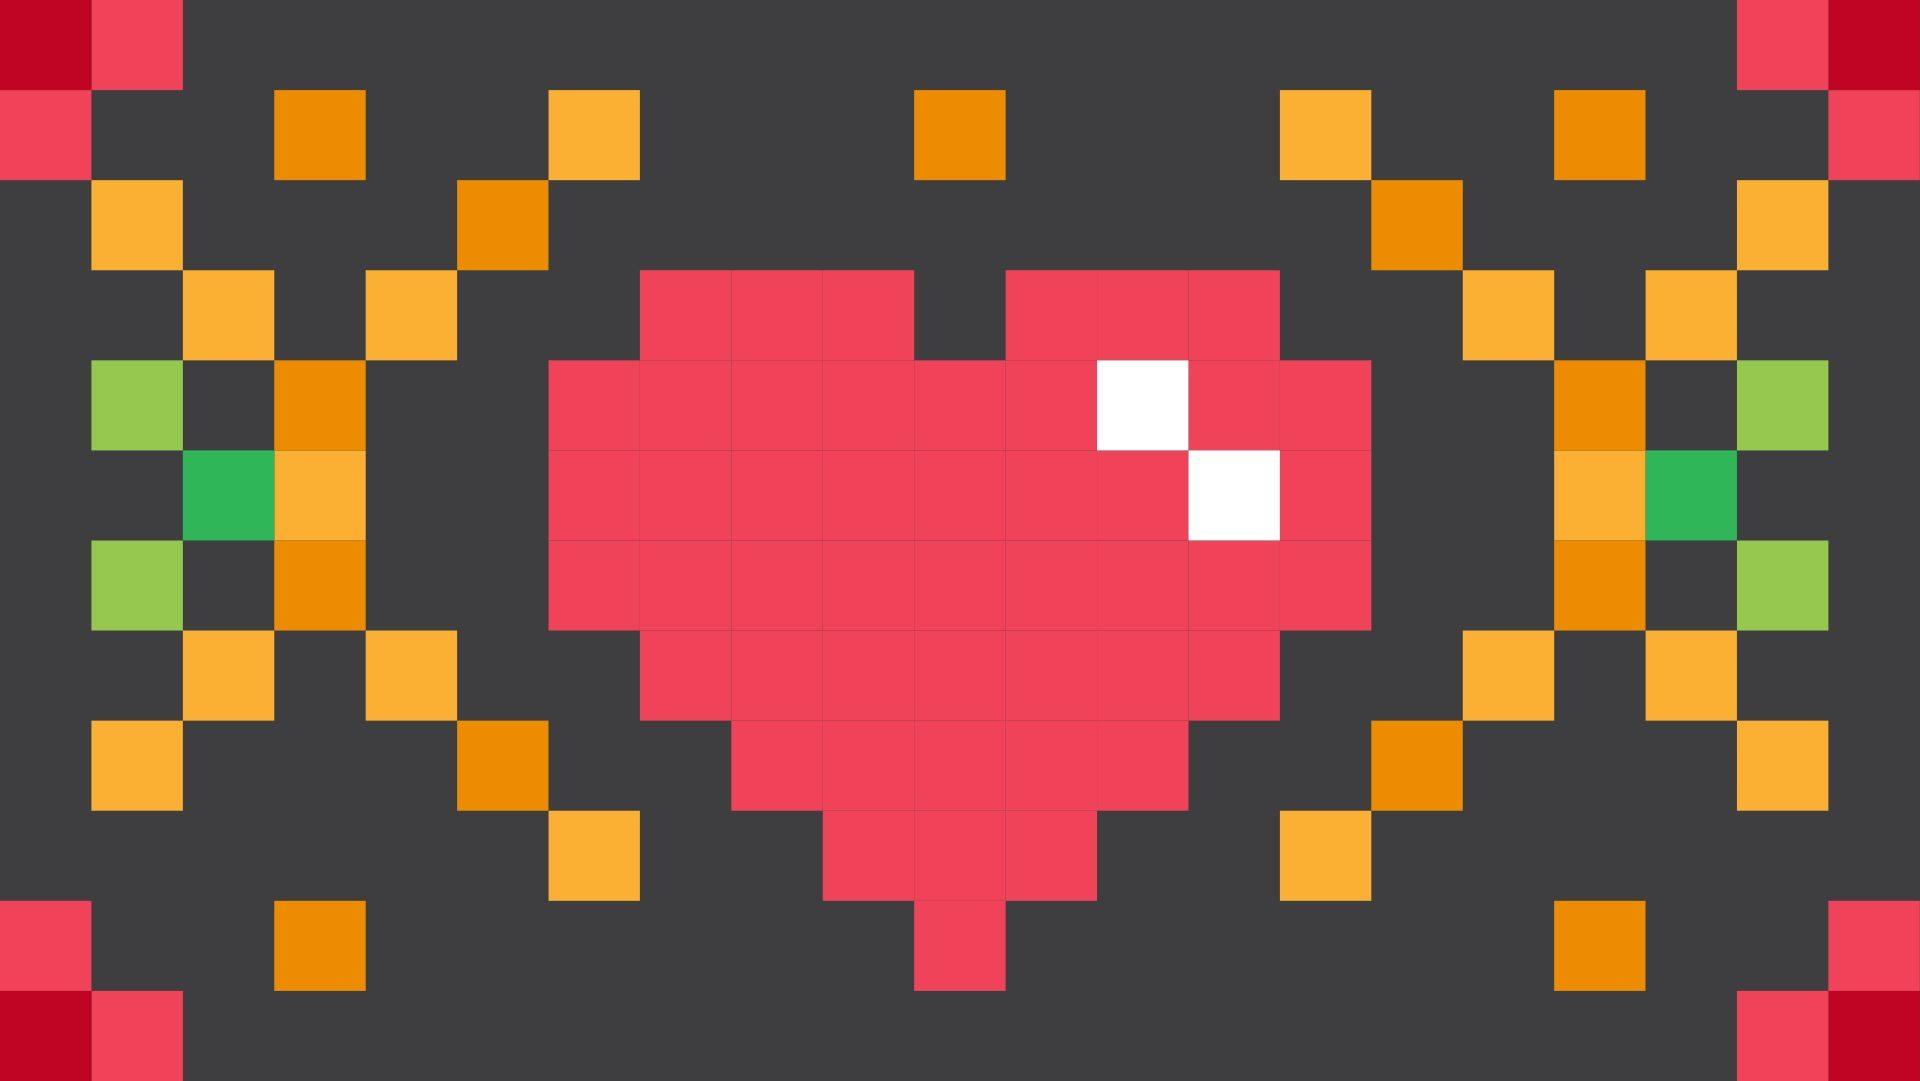 Corazón, pixel, bits de, pixelada, Praça - Papéis de parede HD - Professor-falken.com